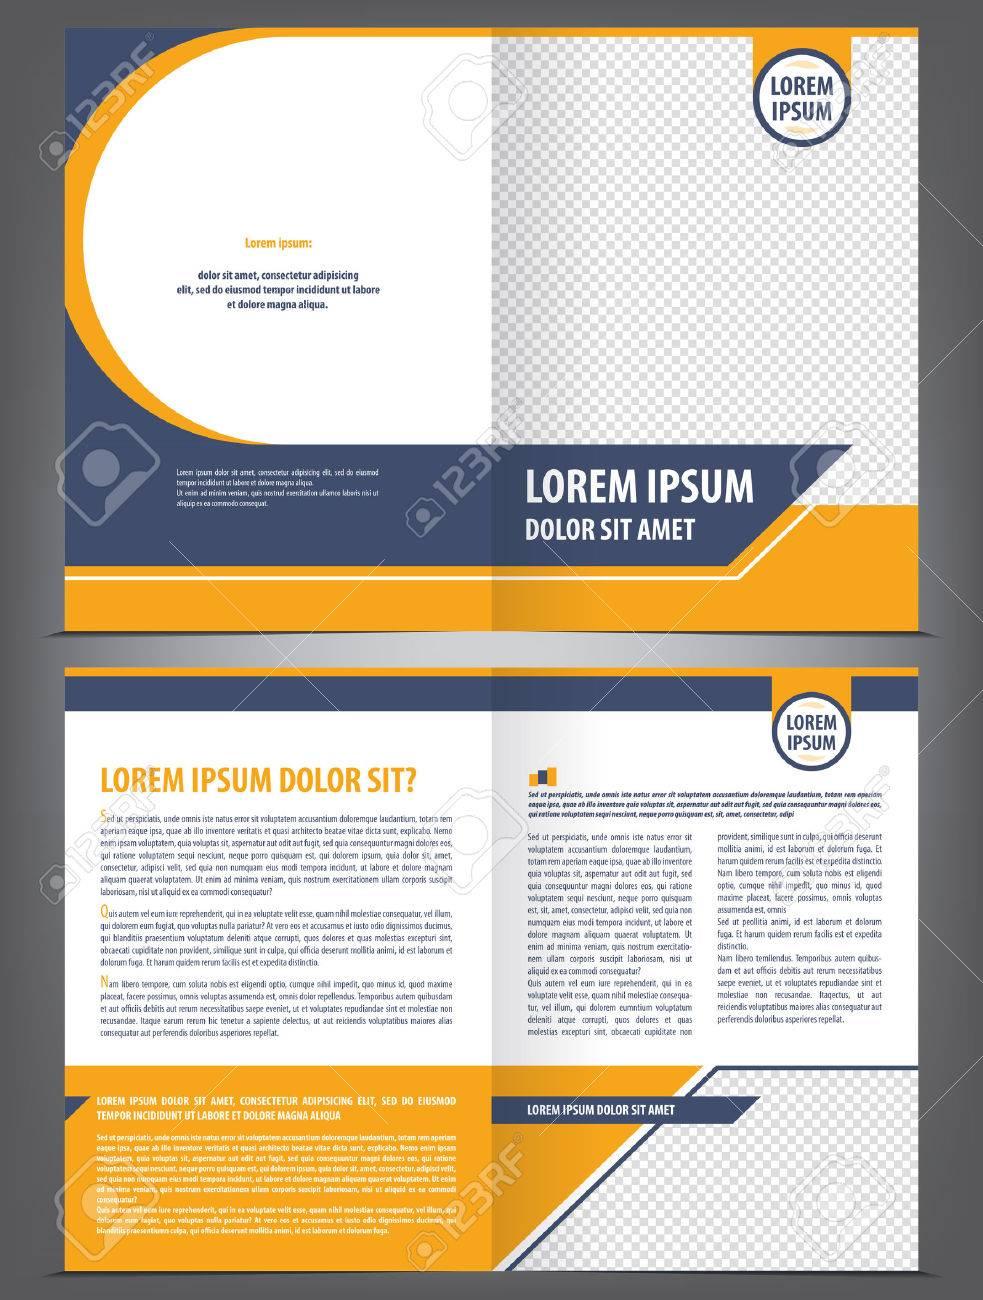 Vector Empty Brochure Template Design With Orange And Dark Blue